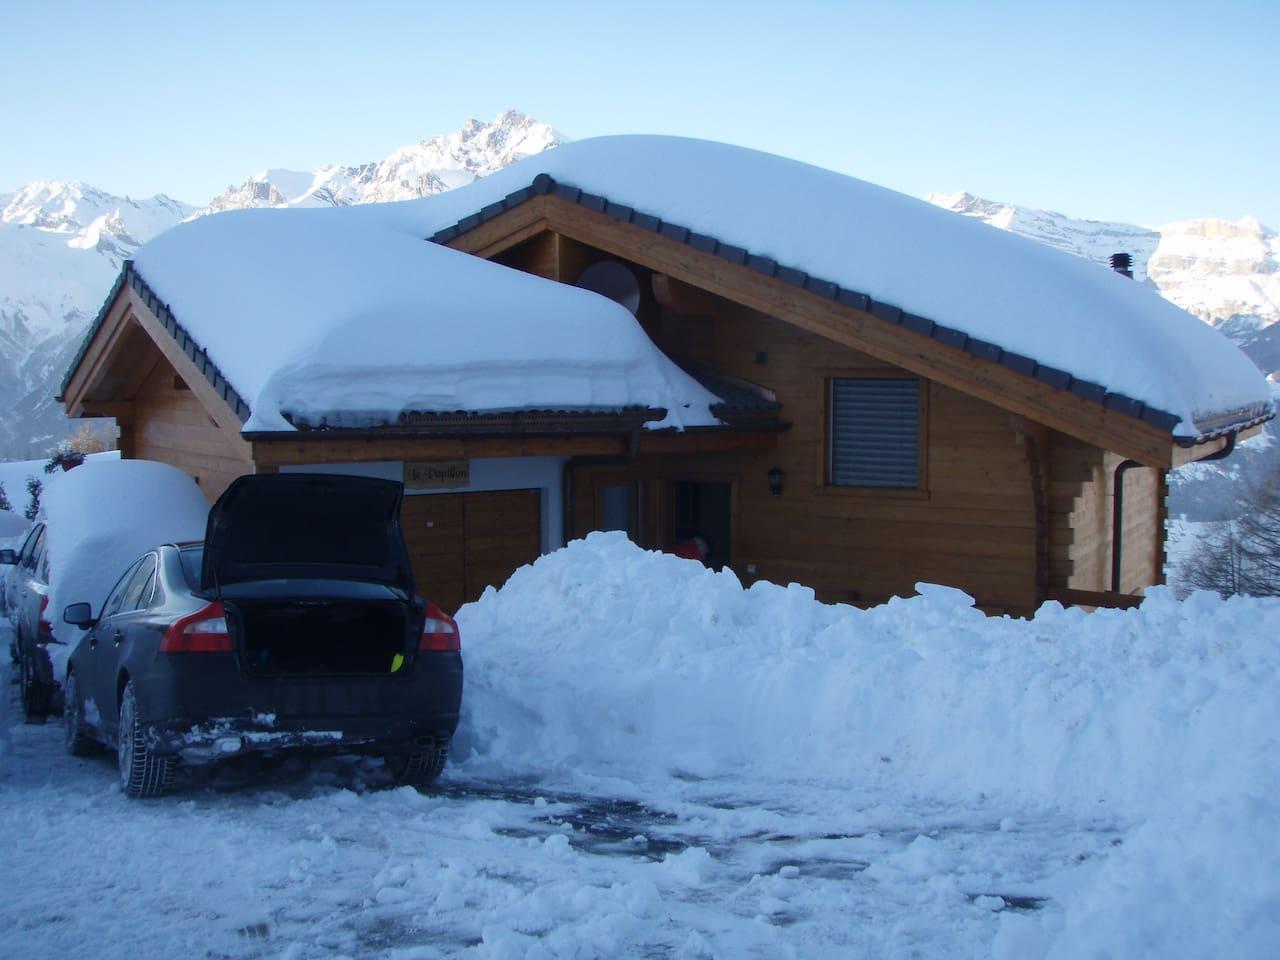 In de winter sneeuwzeker